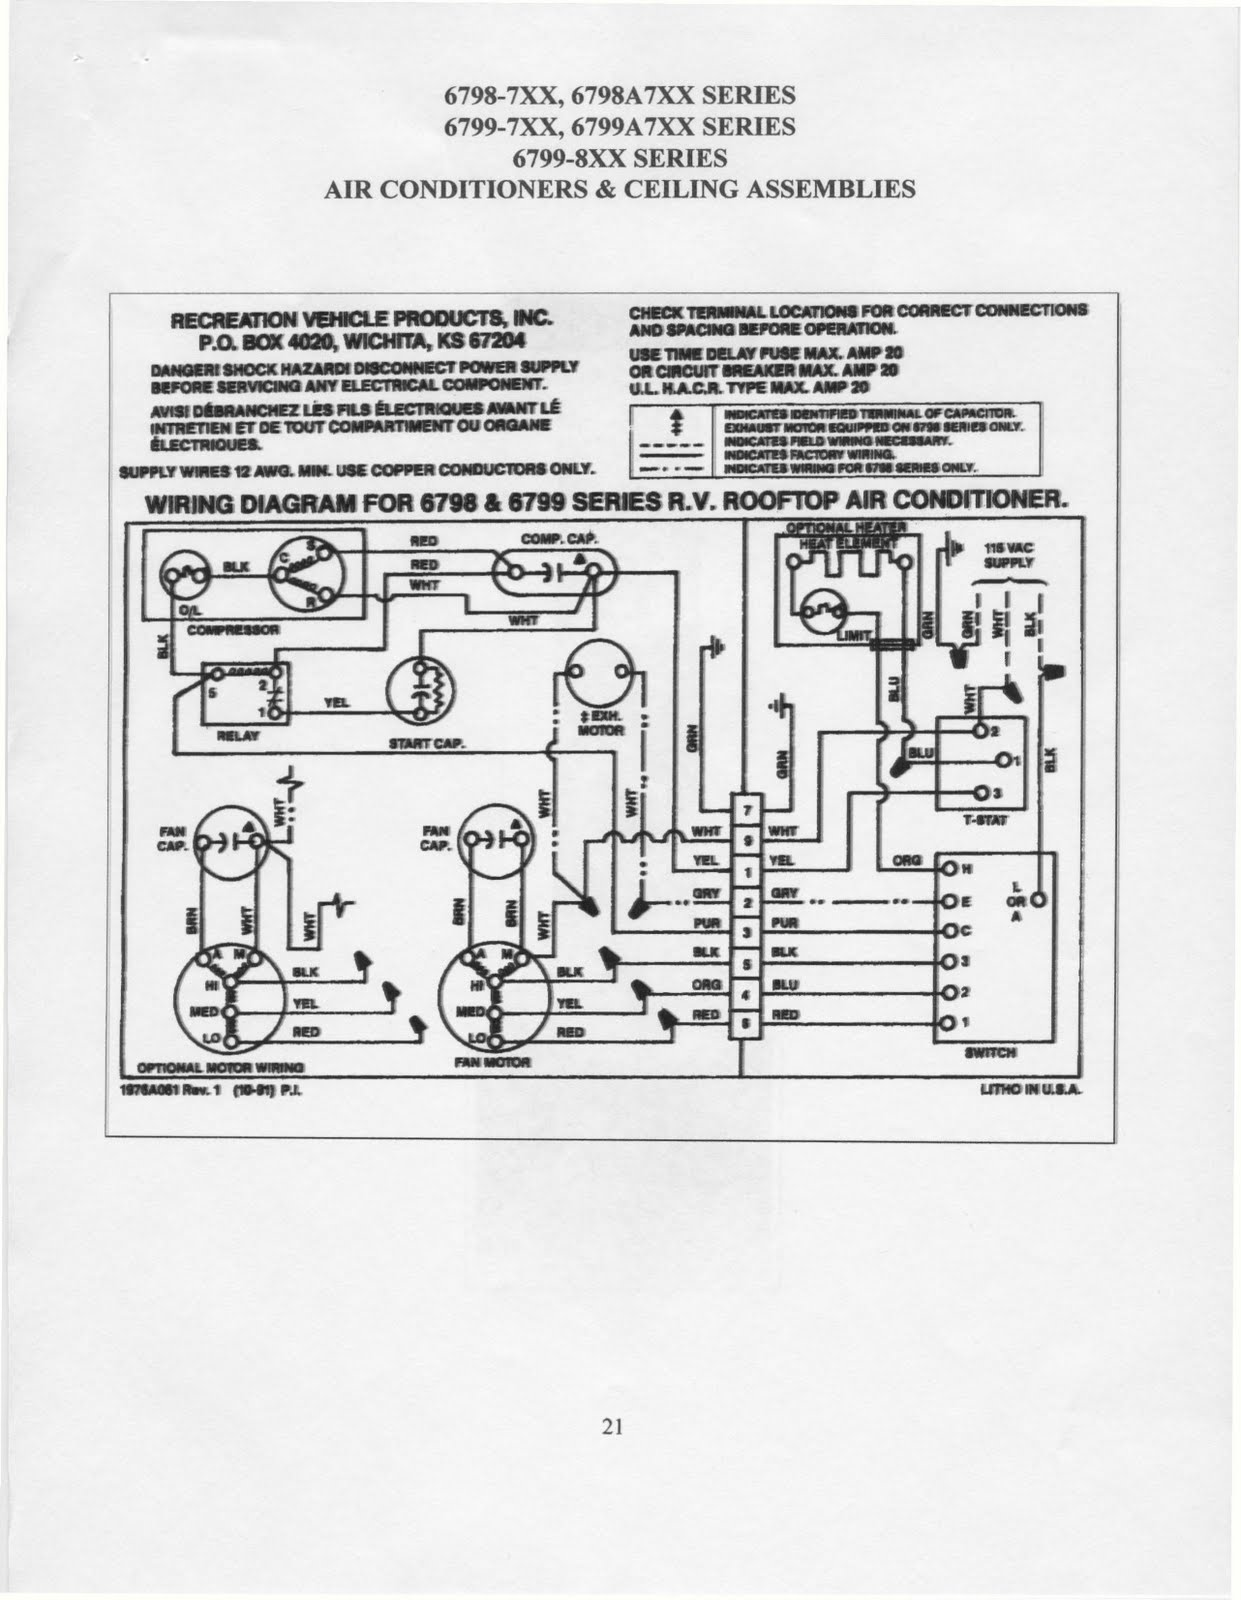 Fleetwood Rv Owners manual Pdf